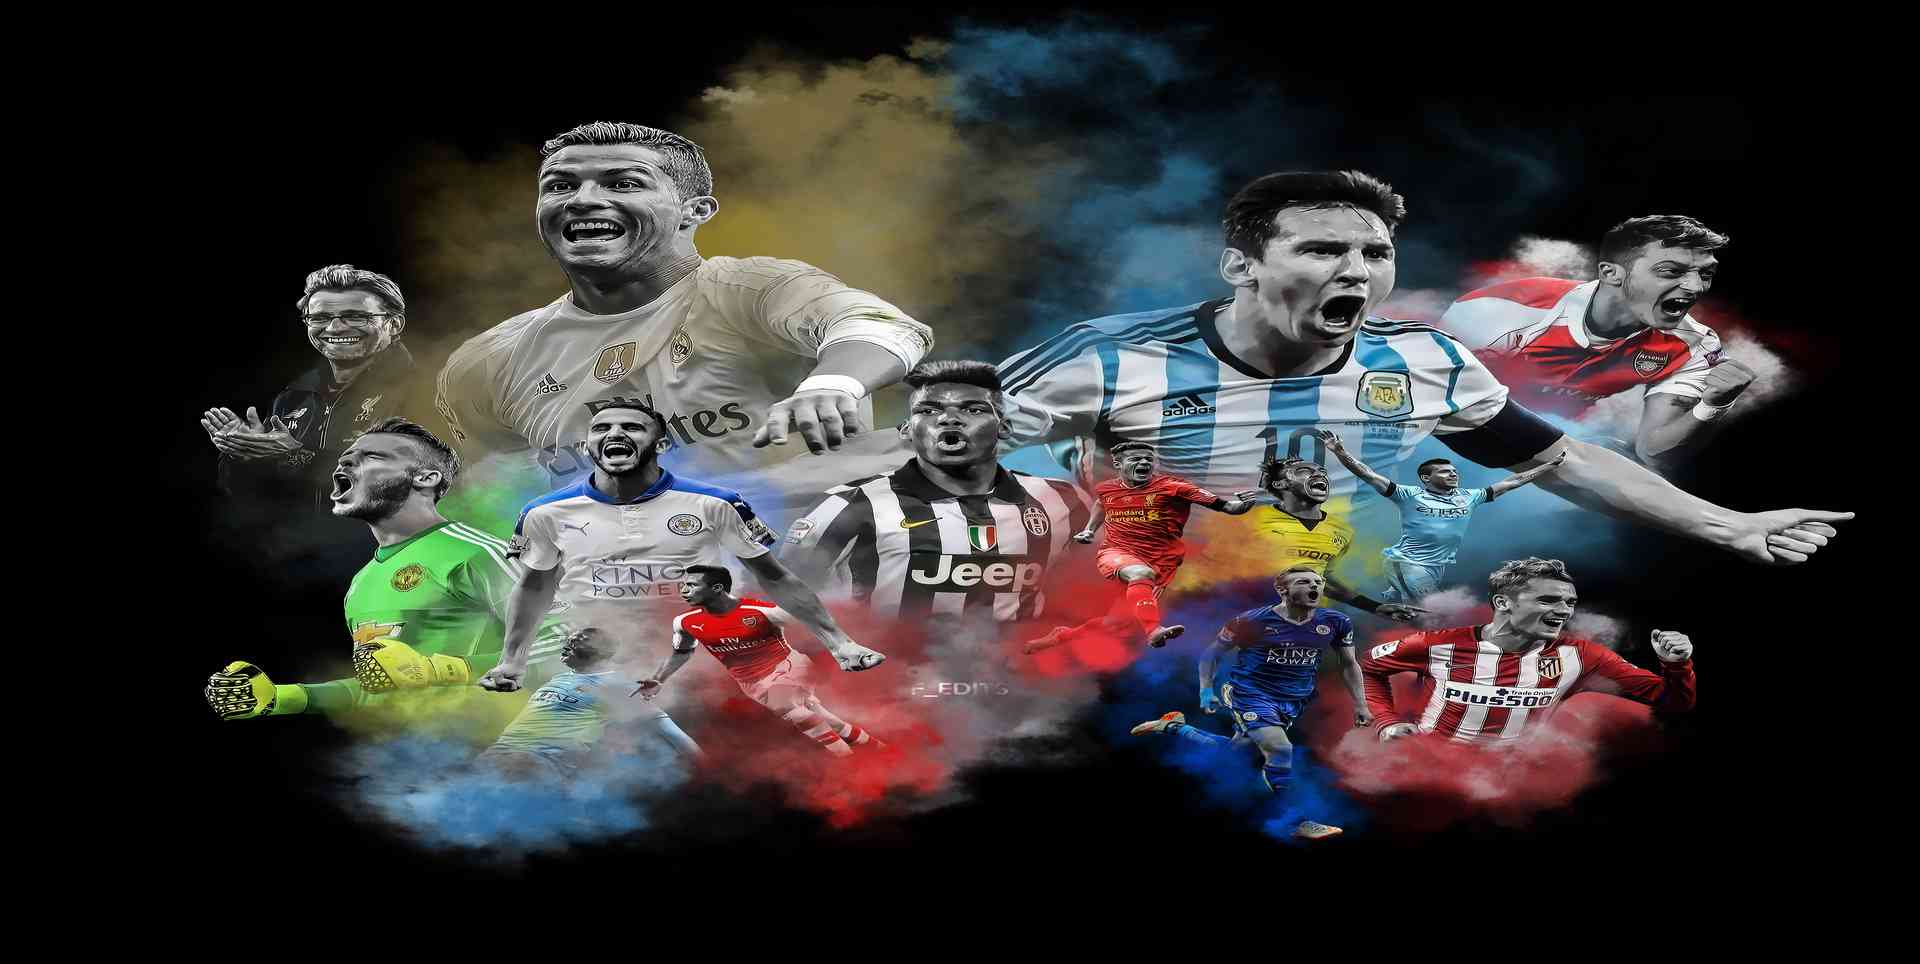 watch-llive-la-liga-sporting-gijon-vs-osasuna